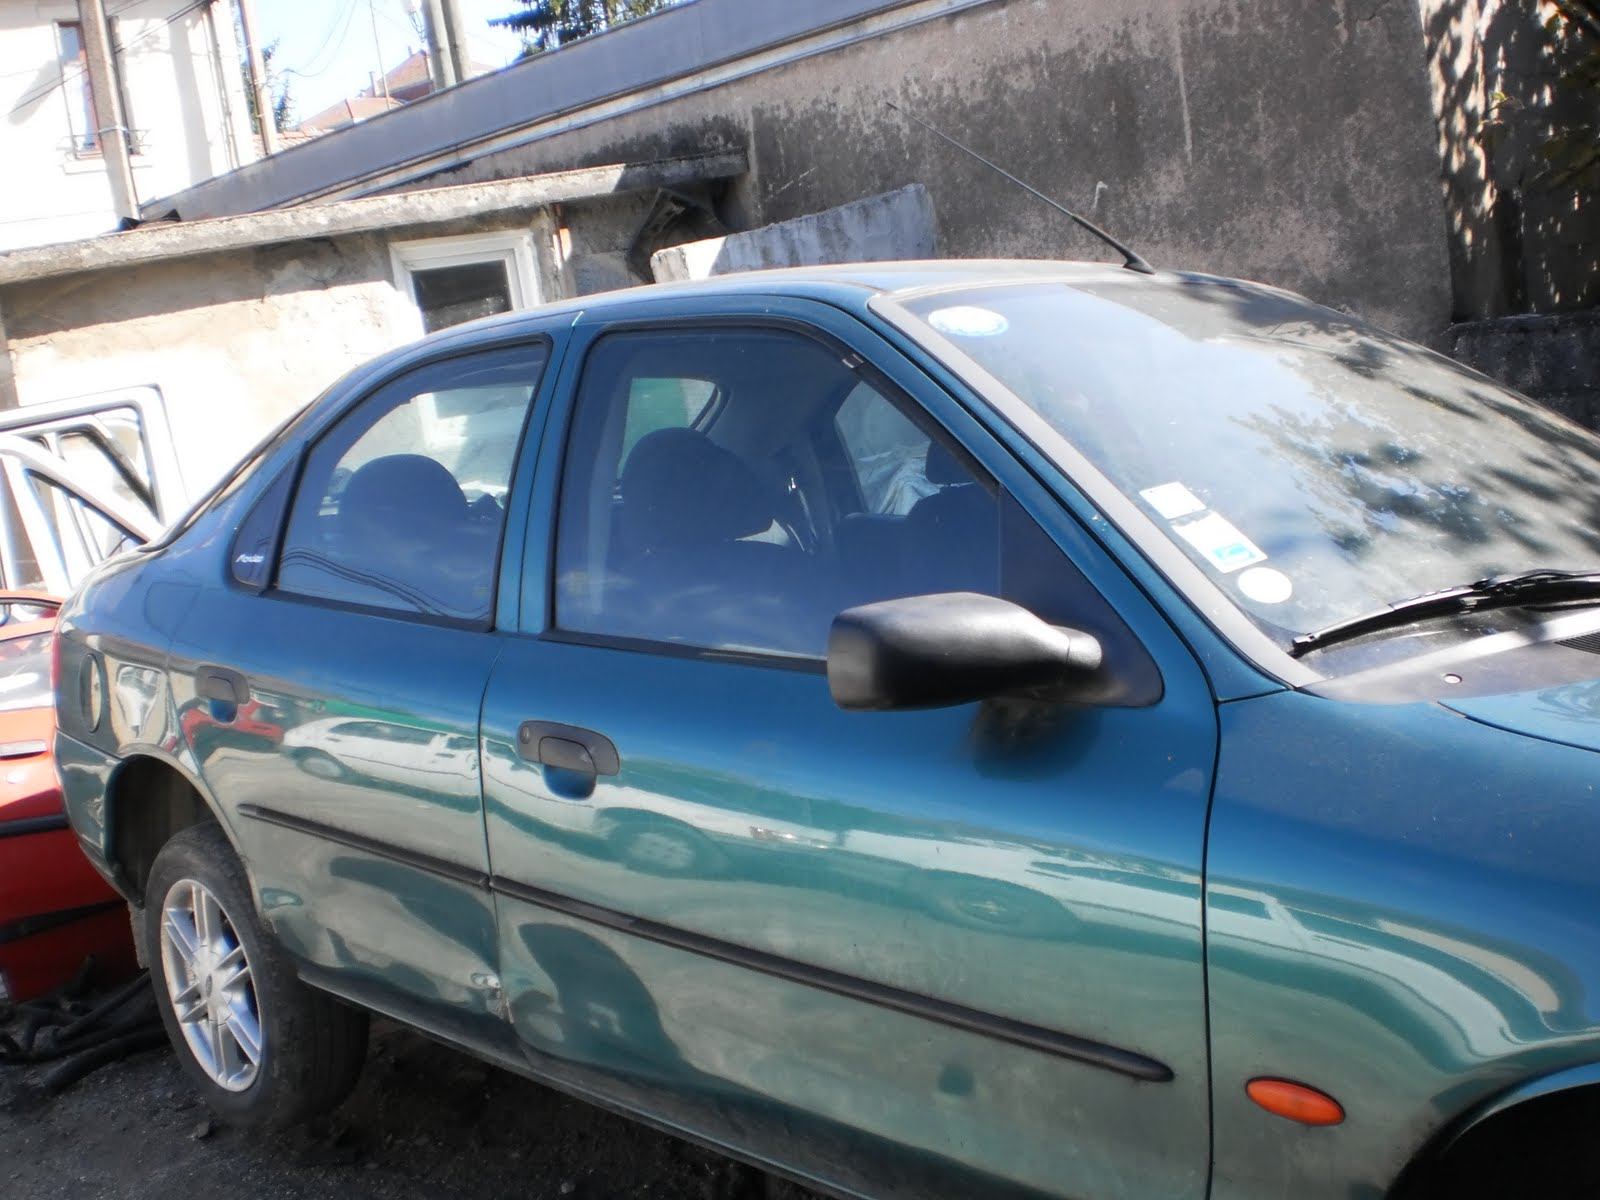 CAR EXPORT BADER DIJON PIECES DETACHEES DOCCASION